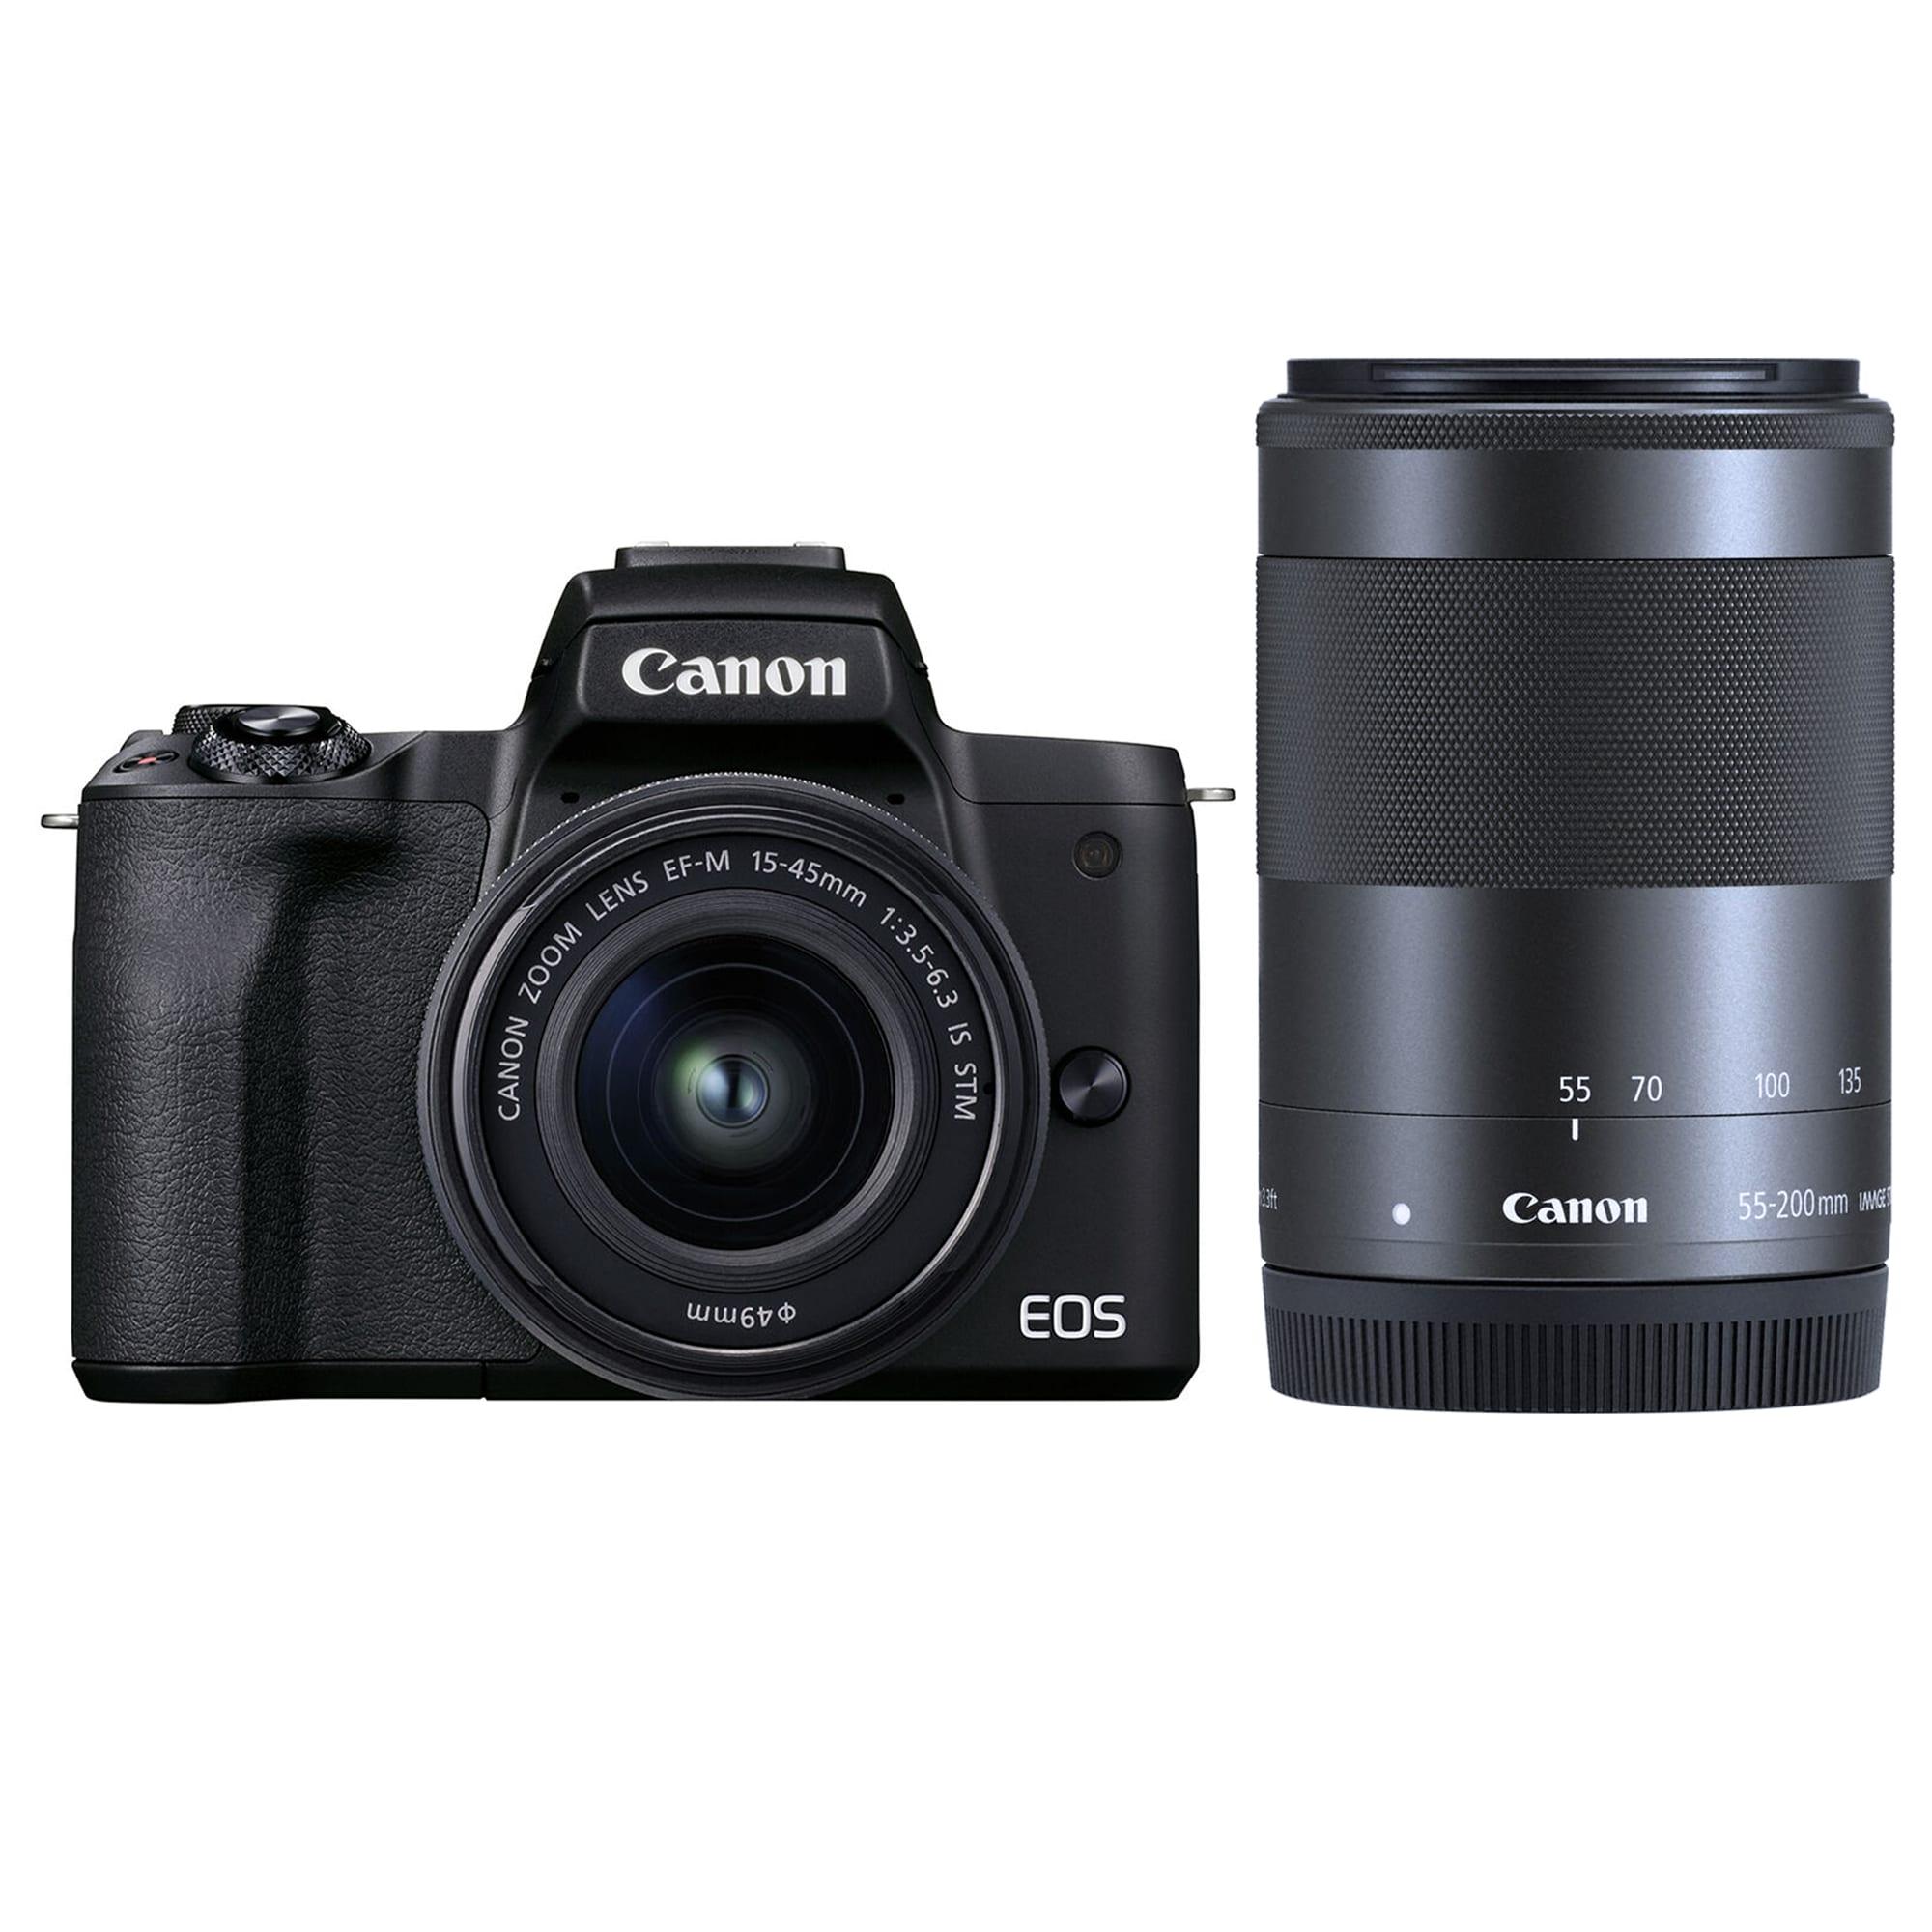 Canon EOS M50 Mark II svart kamerahus + EF-M 15-45/3,5-6,3 IS STM + EF-M 55-200/4,5-6,3 IS STM